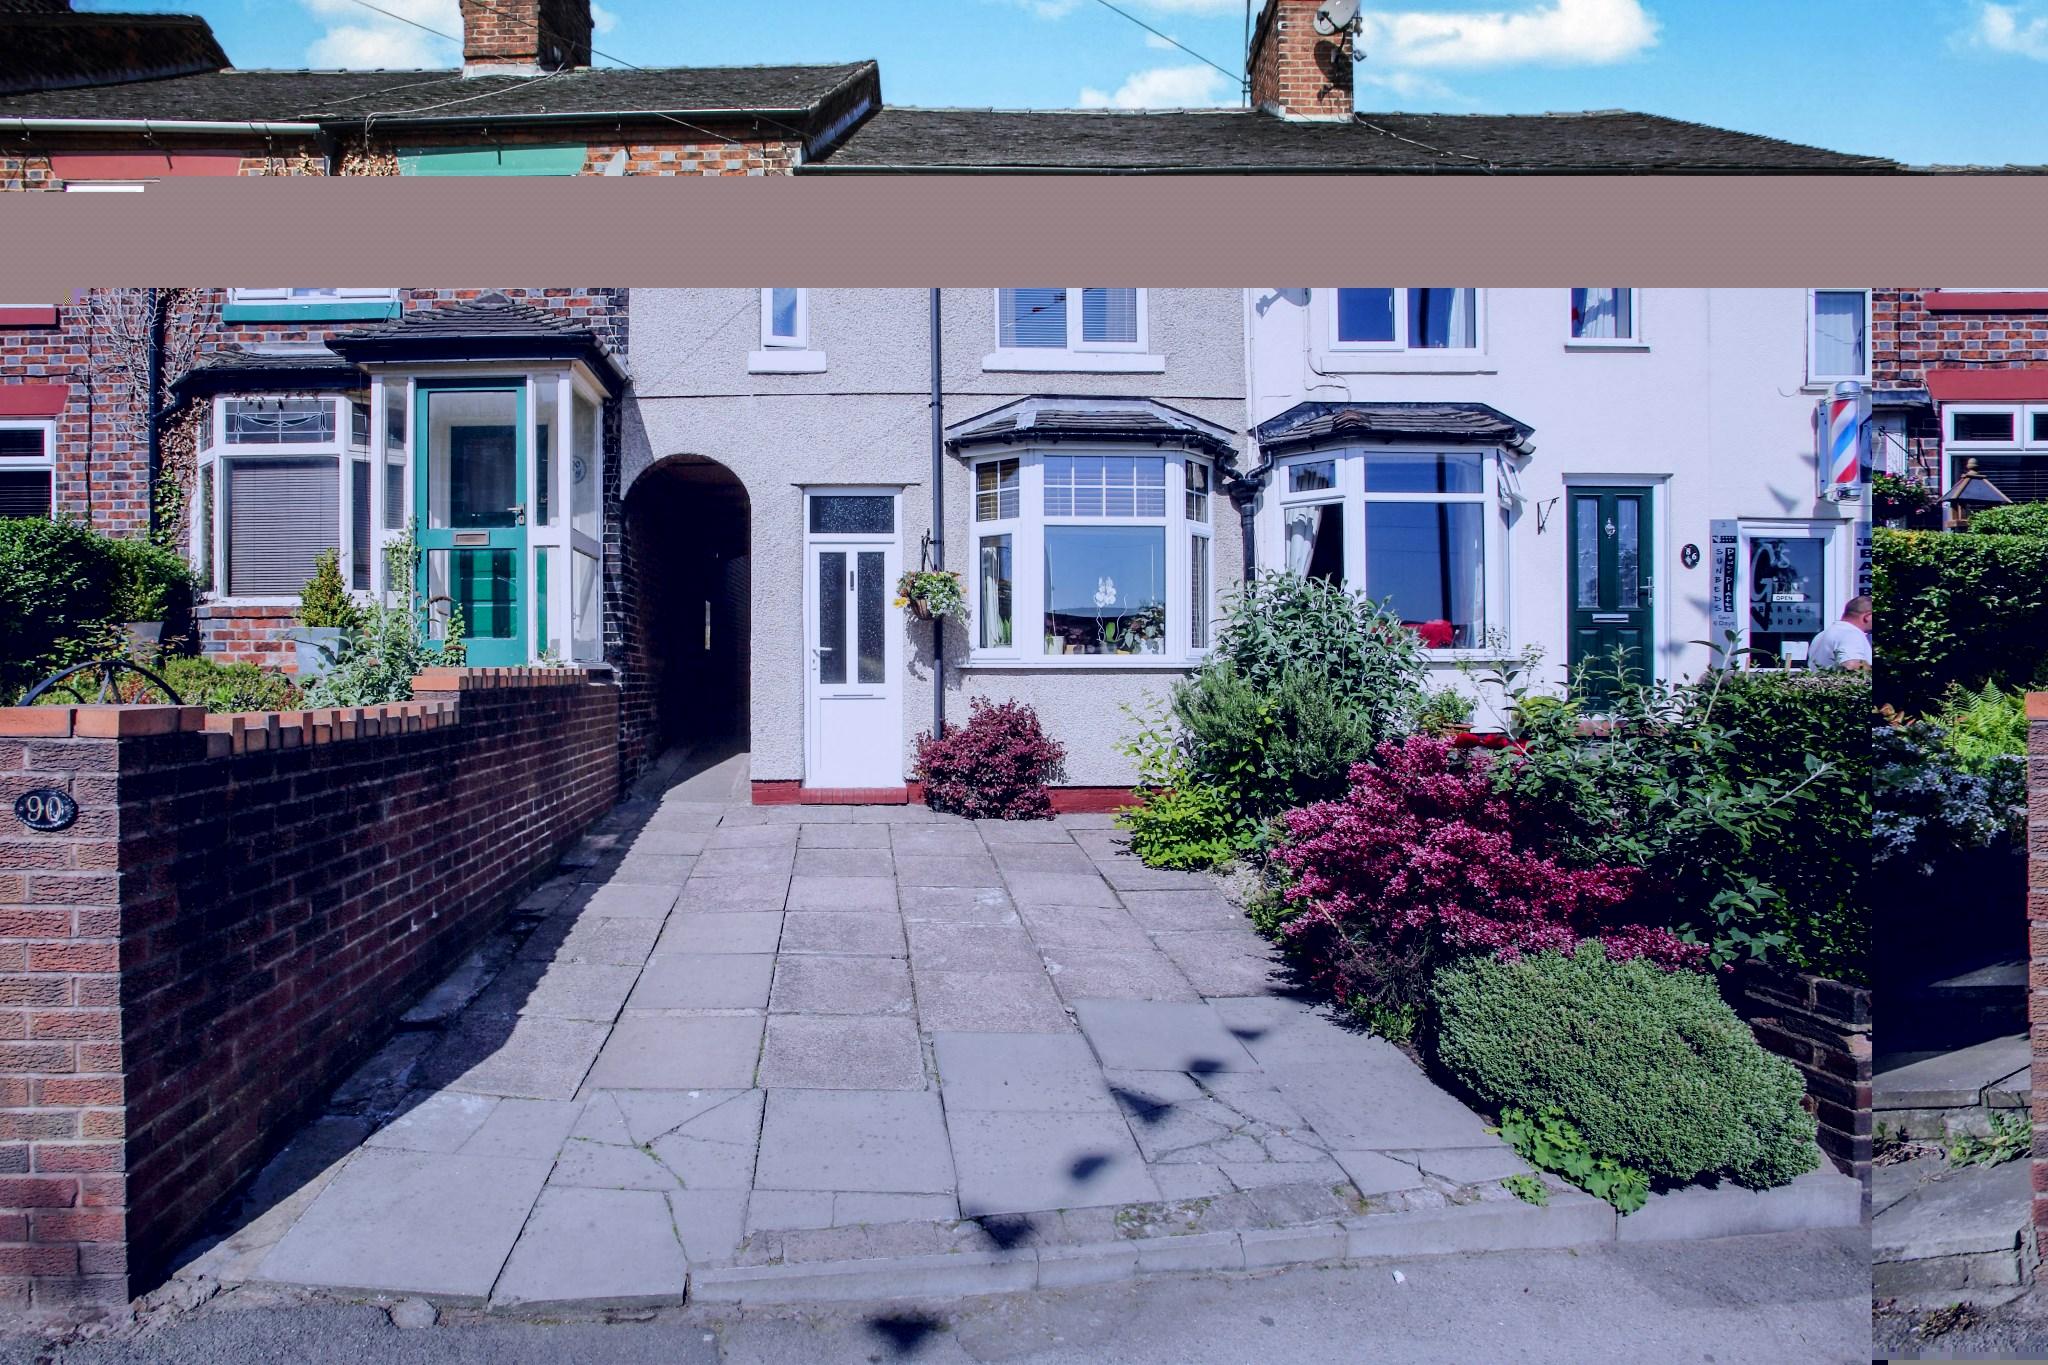 Stoke-On-Trent, 2 bedrooms